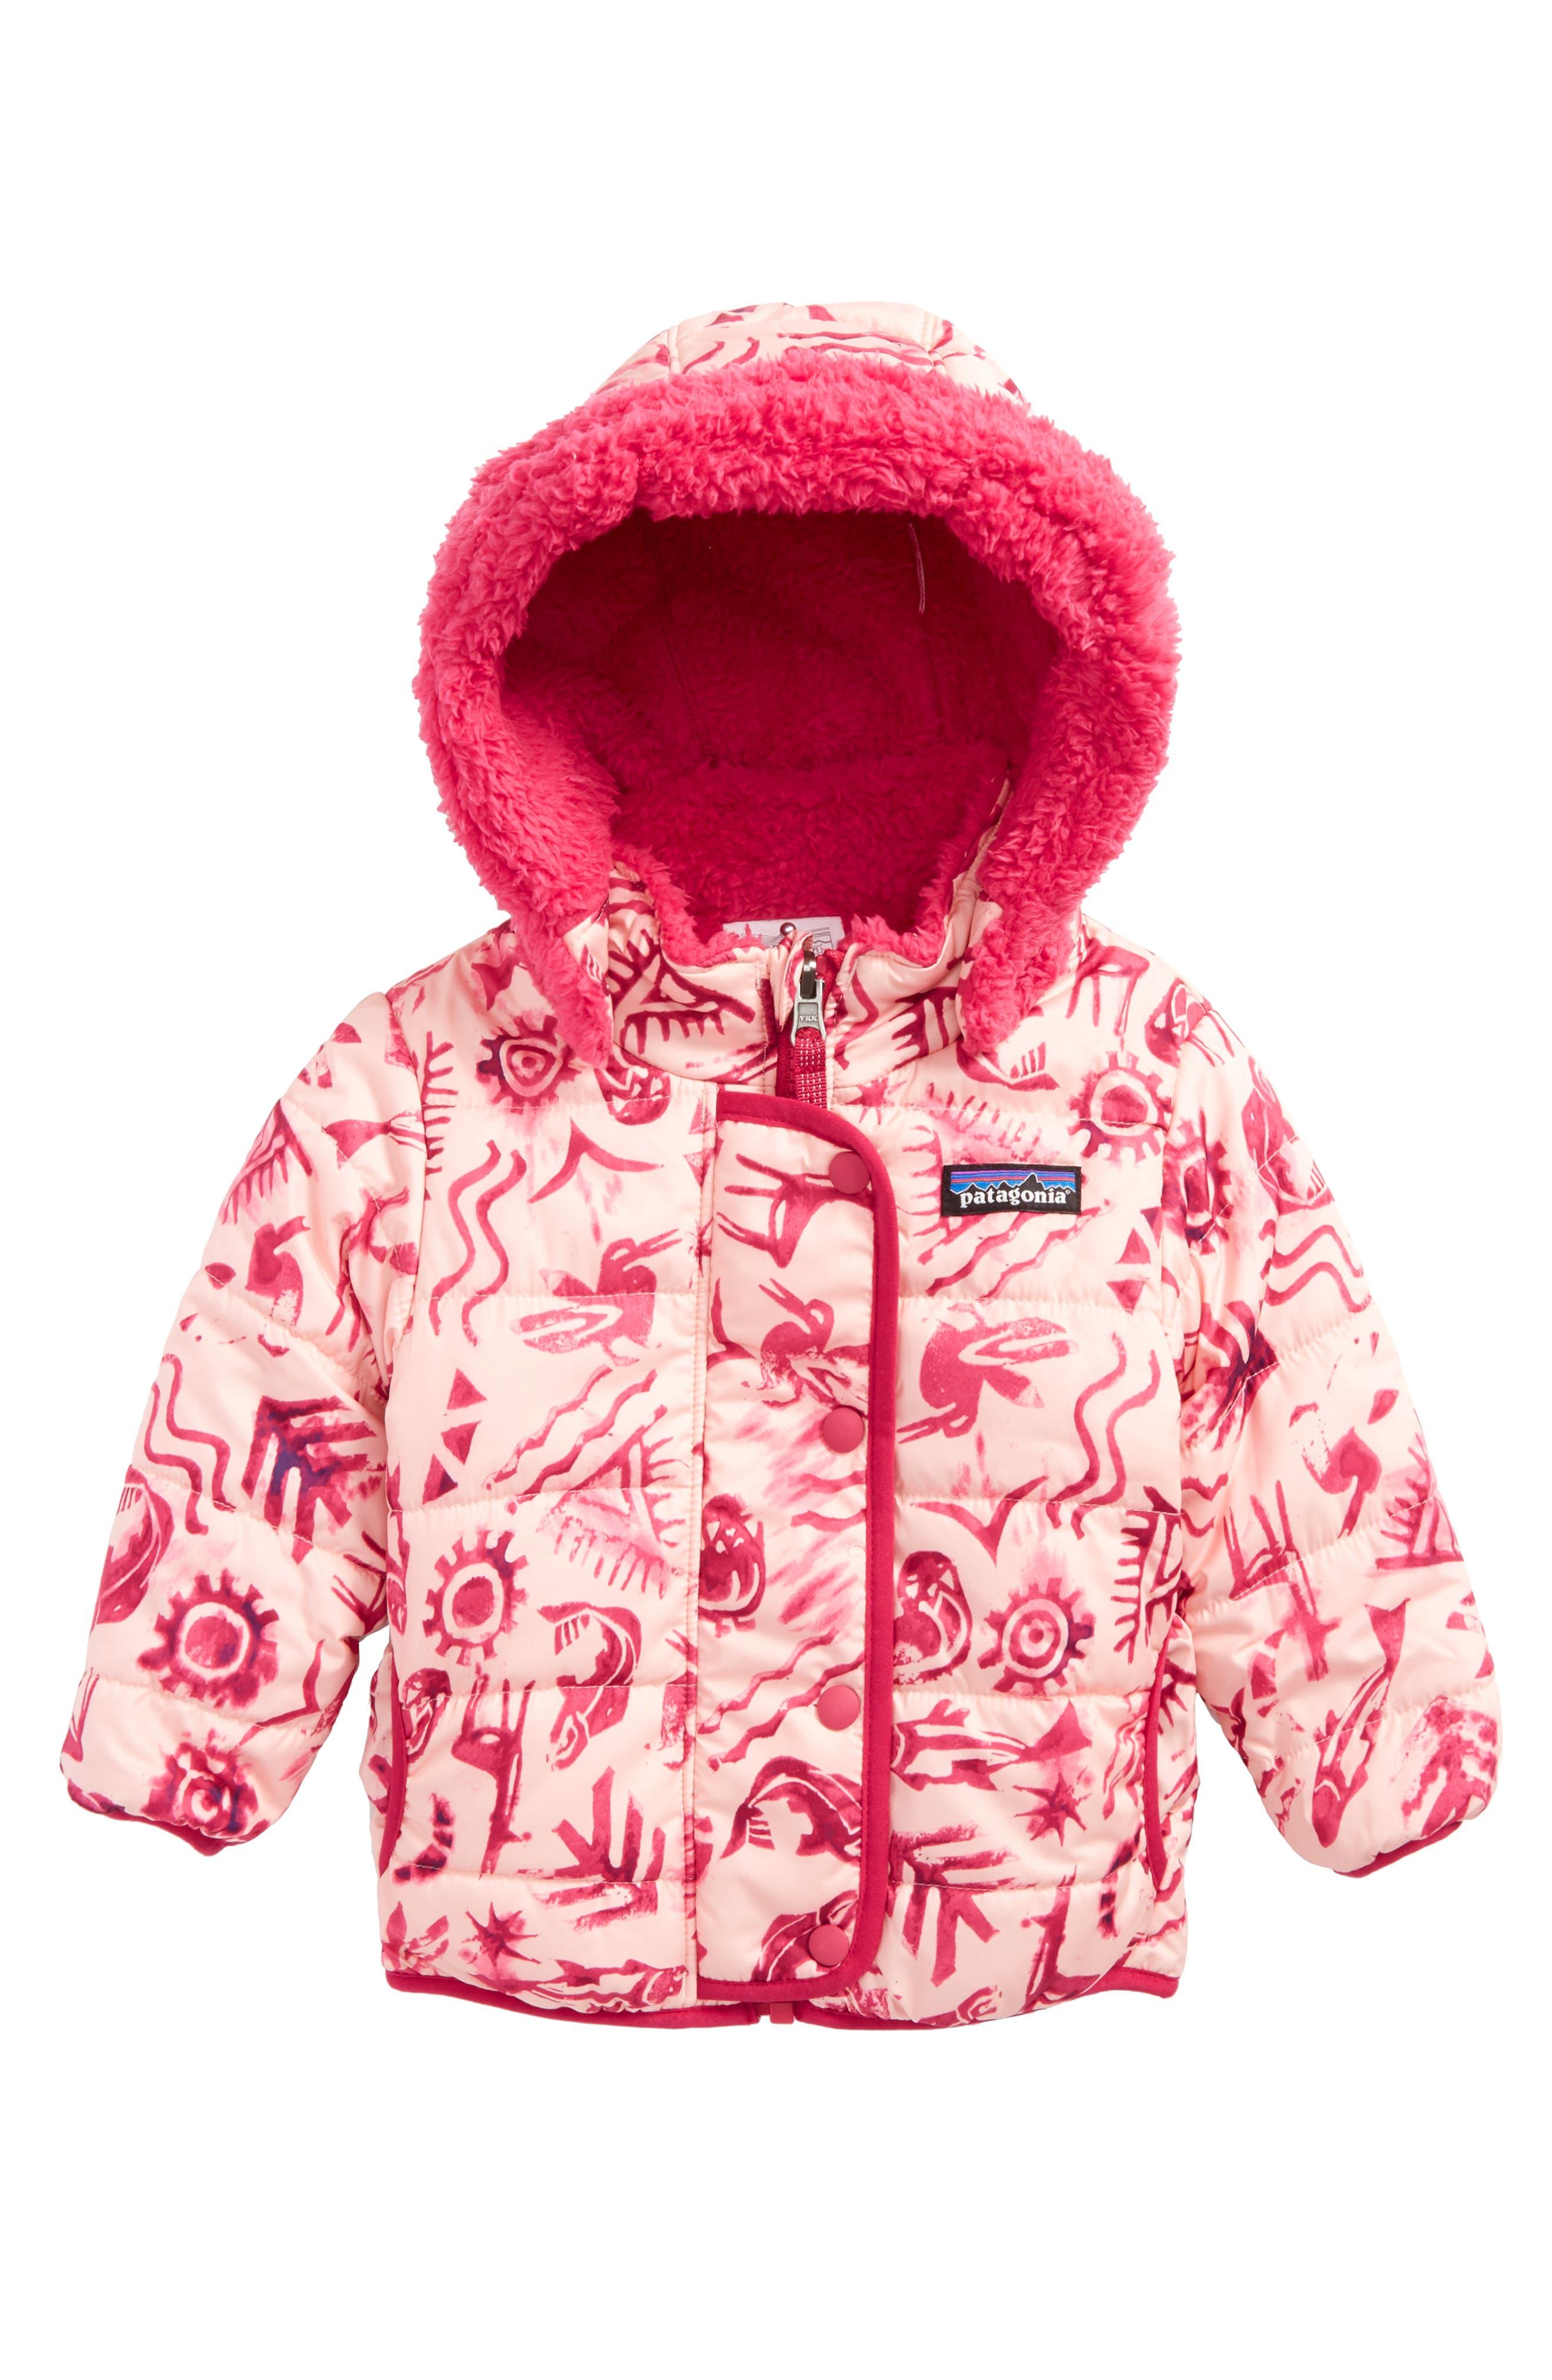 Alternate Image 1 Selected - Patagonia Dream Song Water-Repellent Reversible Jacket (Baby Girls)